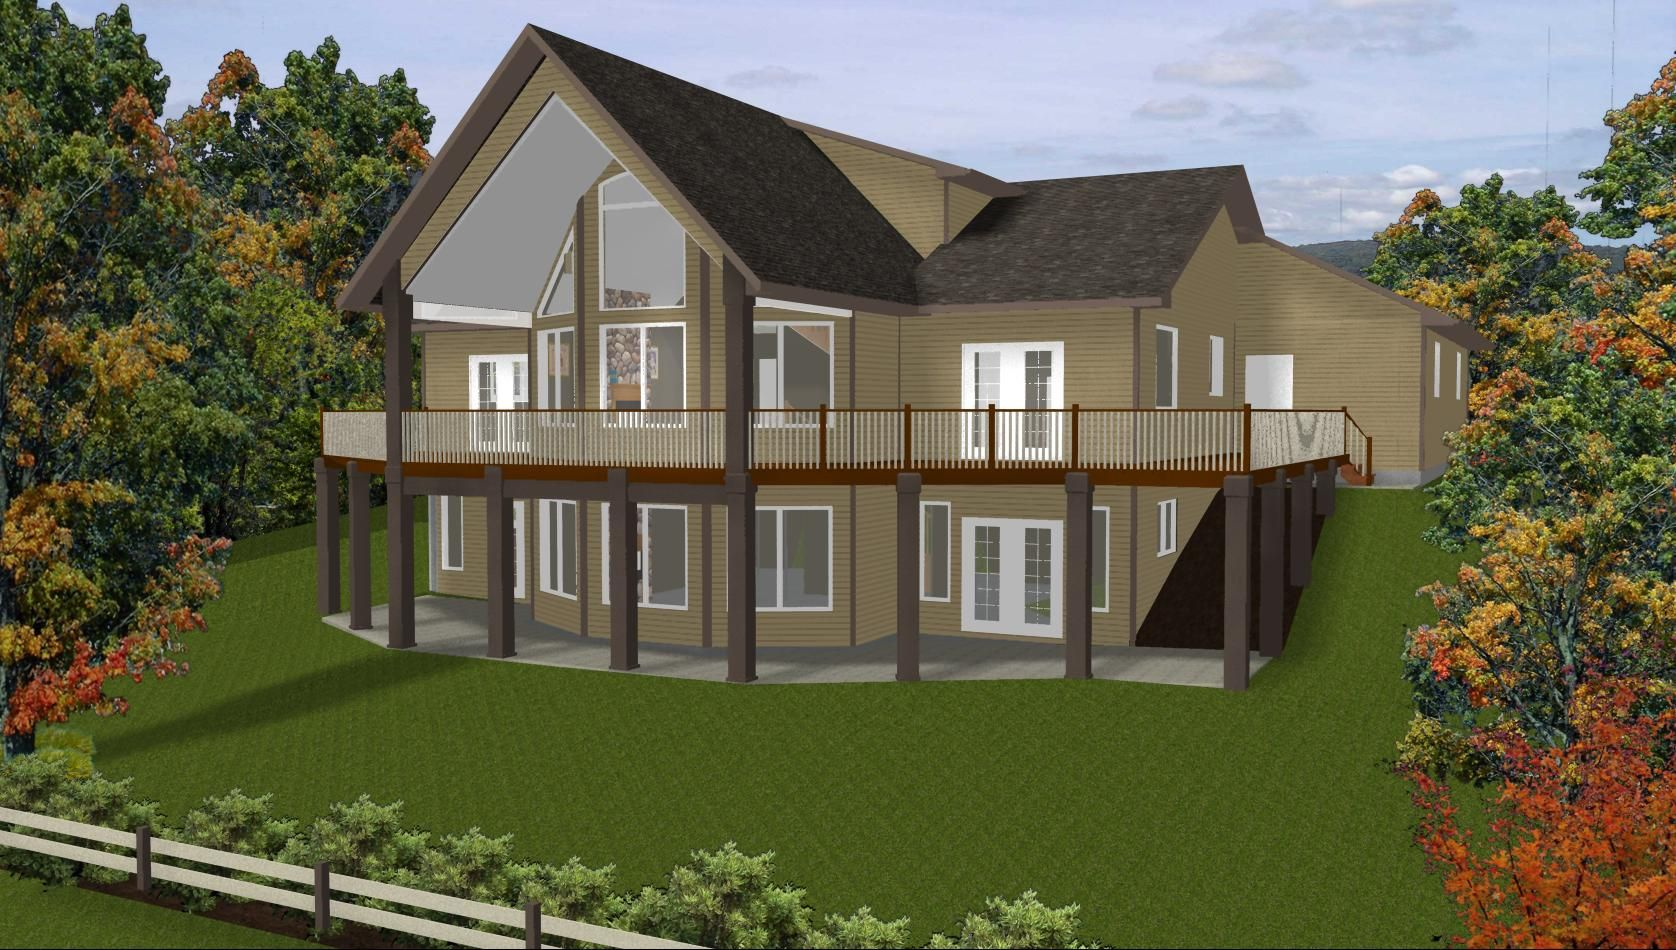 Daylight Basement House Plans Daylight Basement House Plans